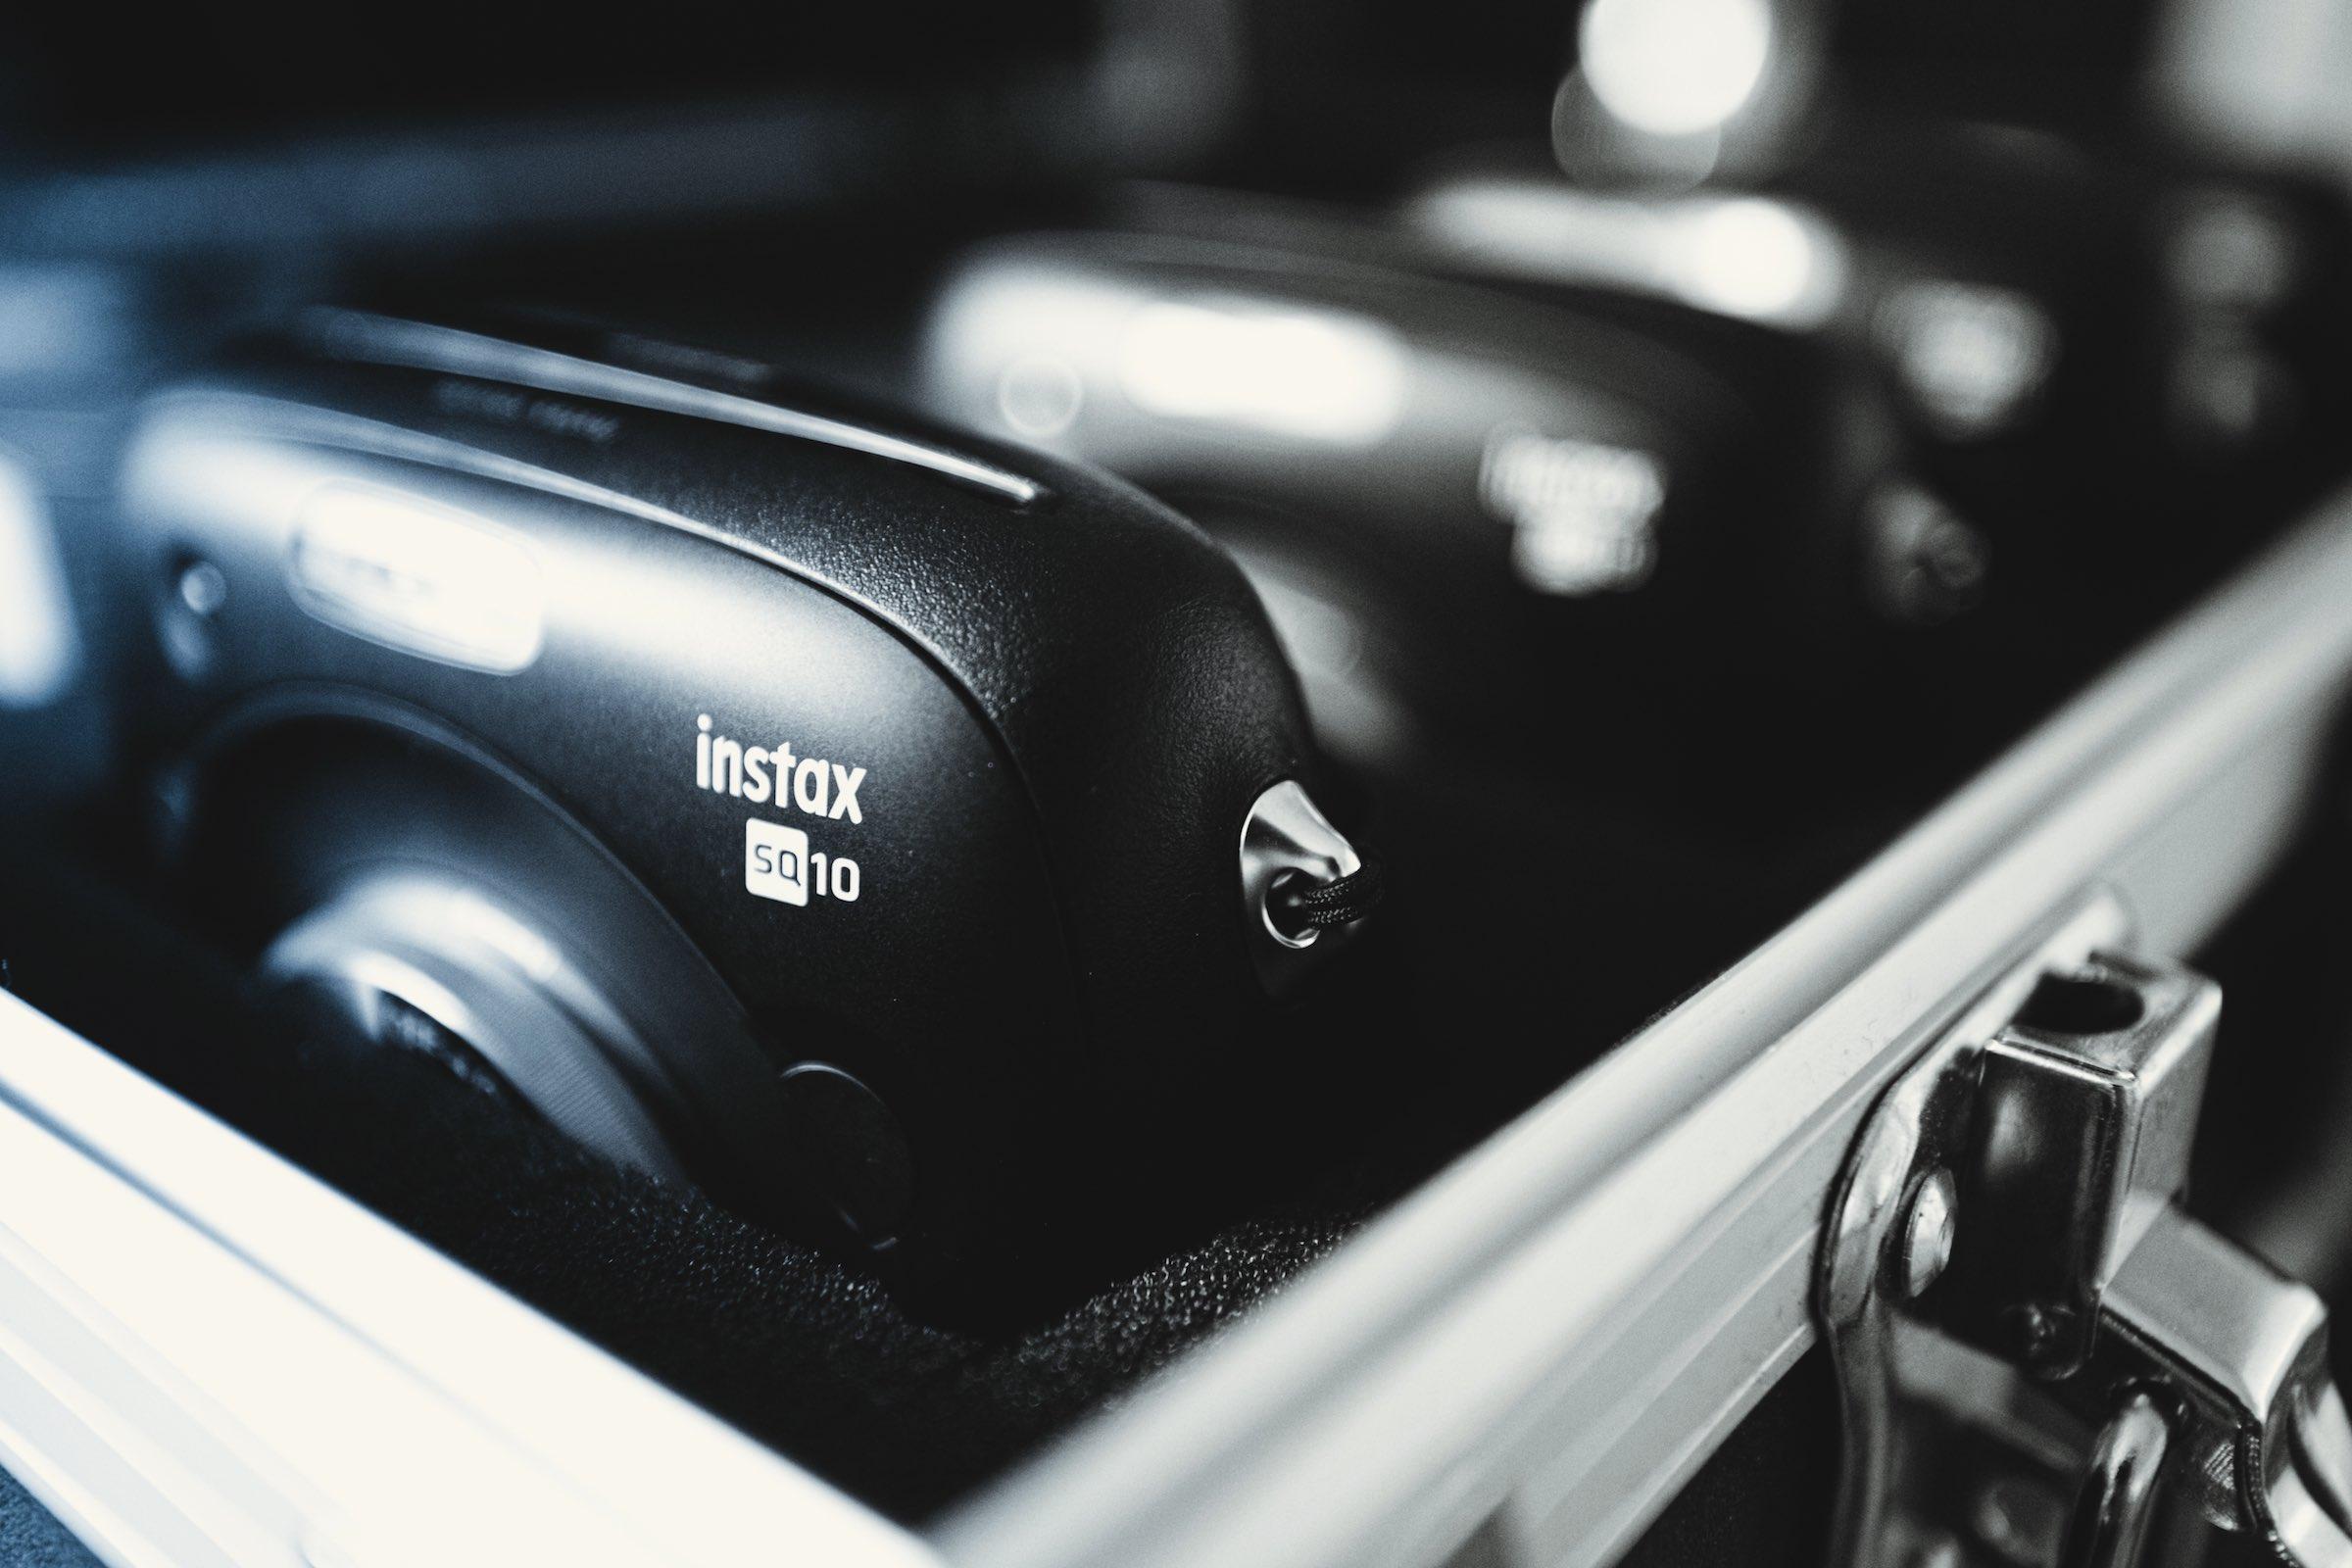 Knipsel | Polaroid | Kamera | Set | Koffer | Bilder | Mieten | Anfragen | Sofortbildkamera | Versand | Lieferung